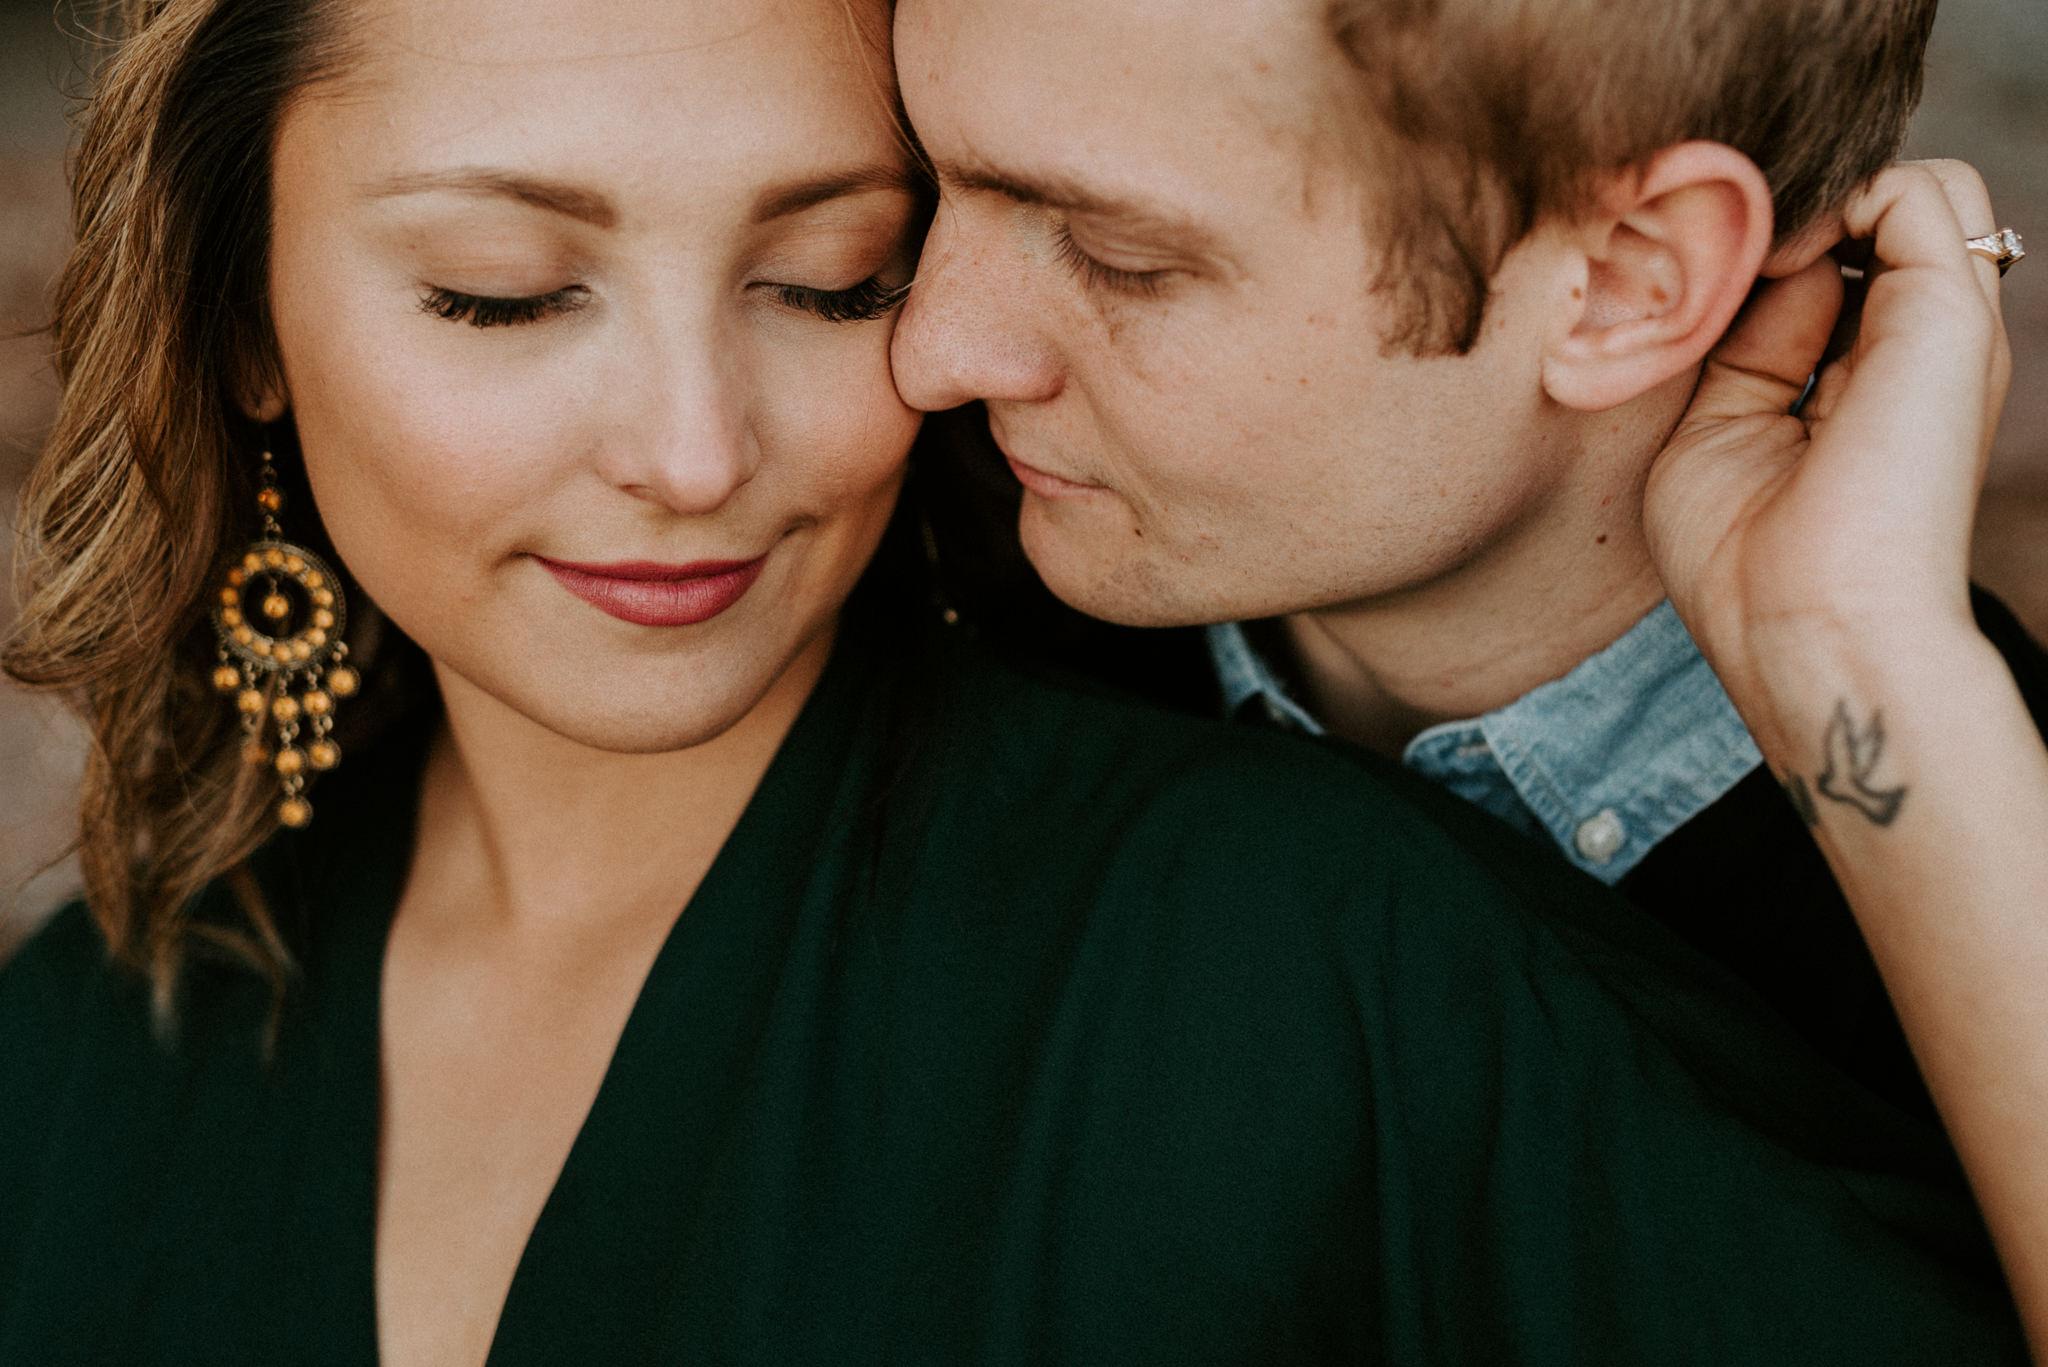 Kerlyn-Van-Gelder-Photography-Texas-and-Oregon-Photographer16.jpgStunning-Midday-Intimate-Moody-Engagement-Session-at-Enchanted-Rock-Kerlyn-Van-Gelder-Photography-Austin-Wedding-Photographer